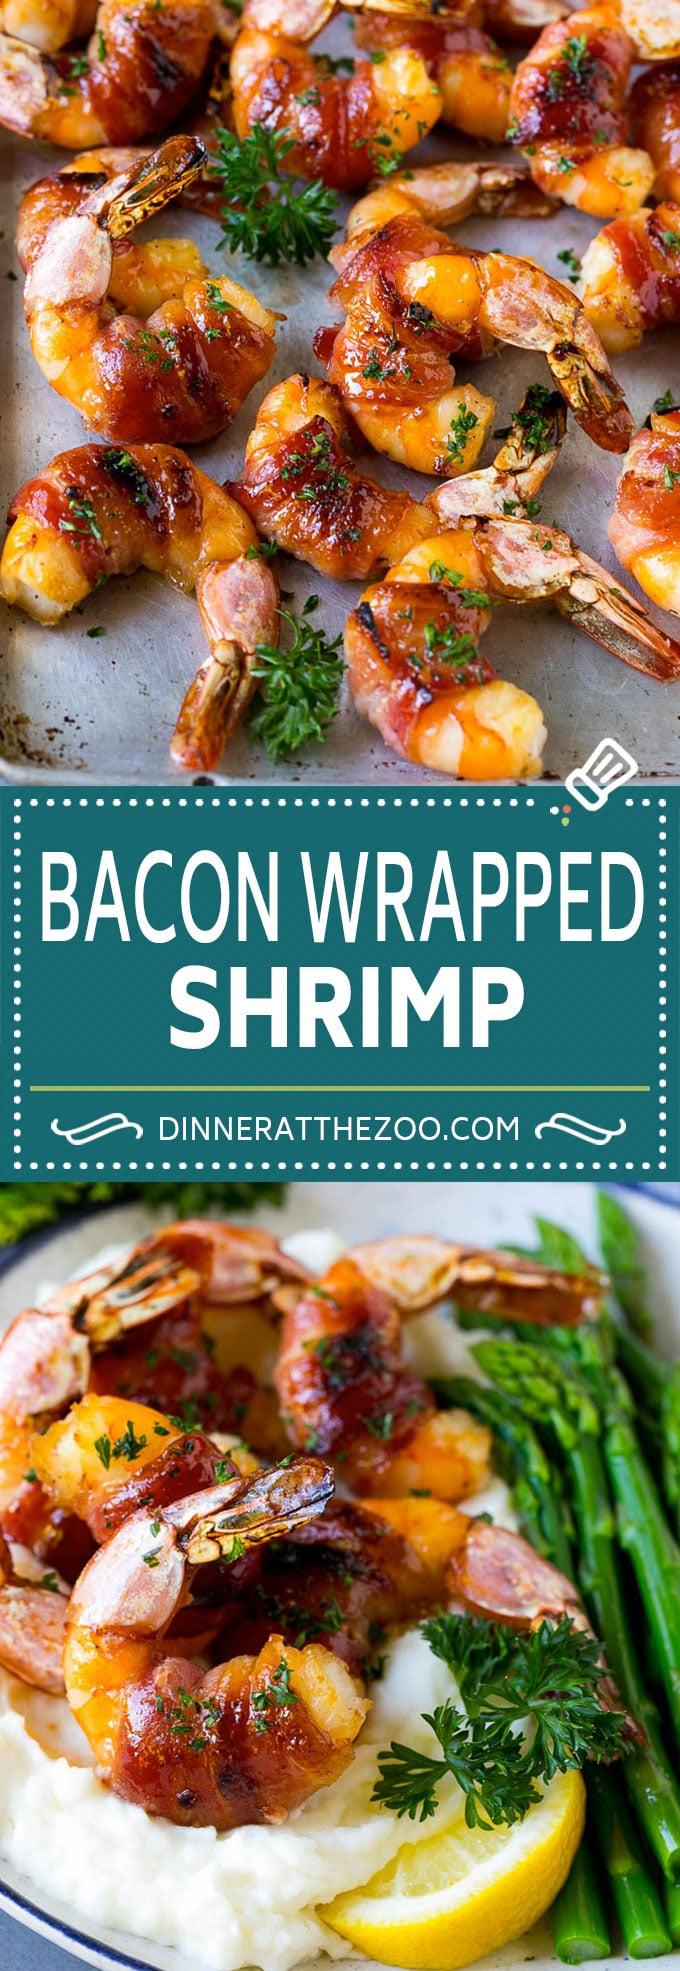 Photo of Bacon Wrapped Shrimp